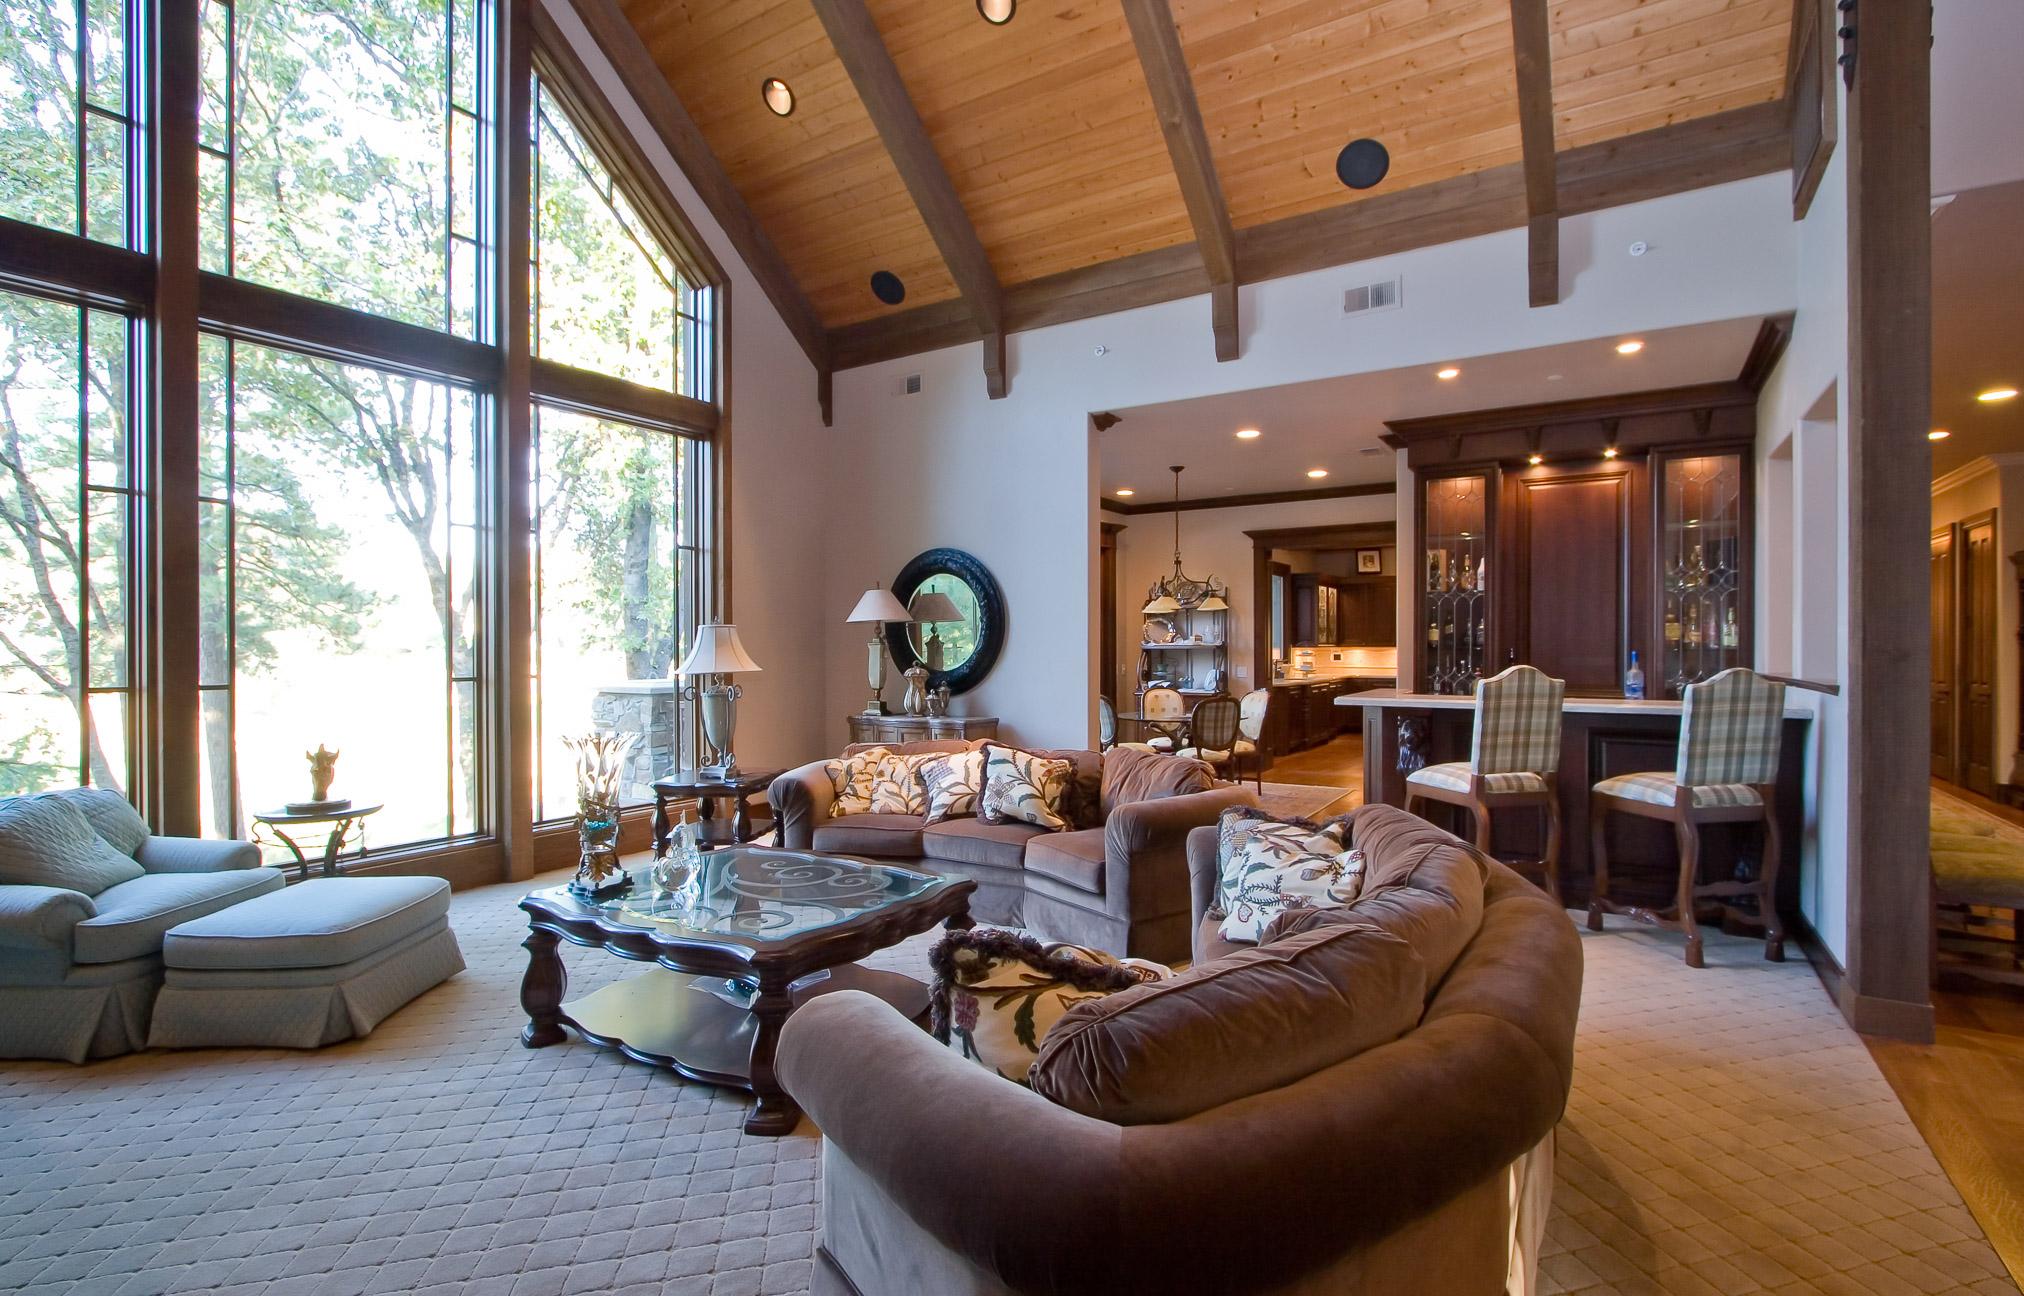 Northern California Rustic Home Builder-11.jpg